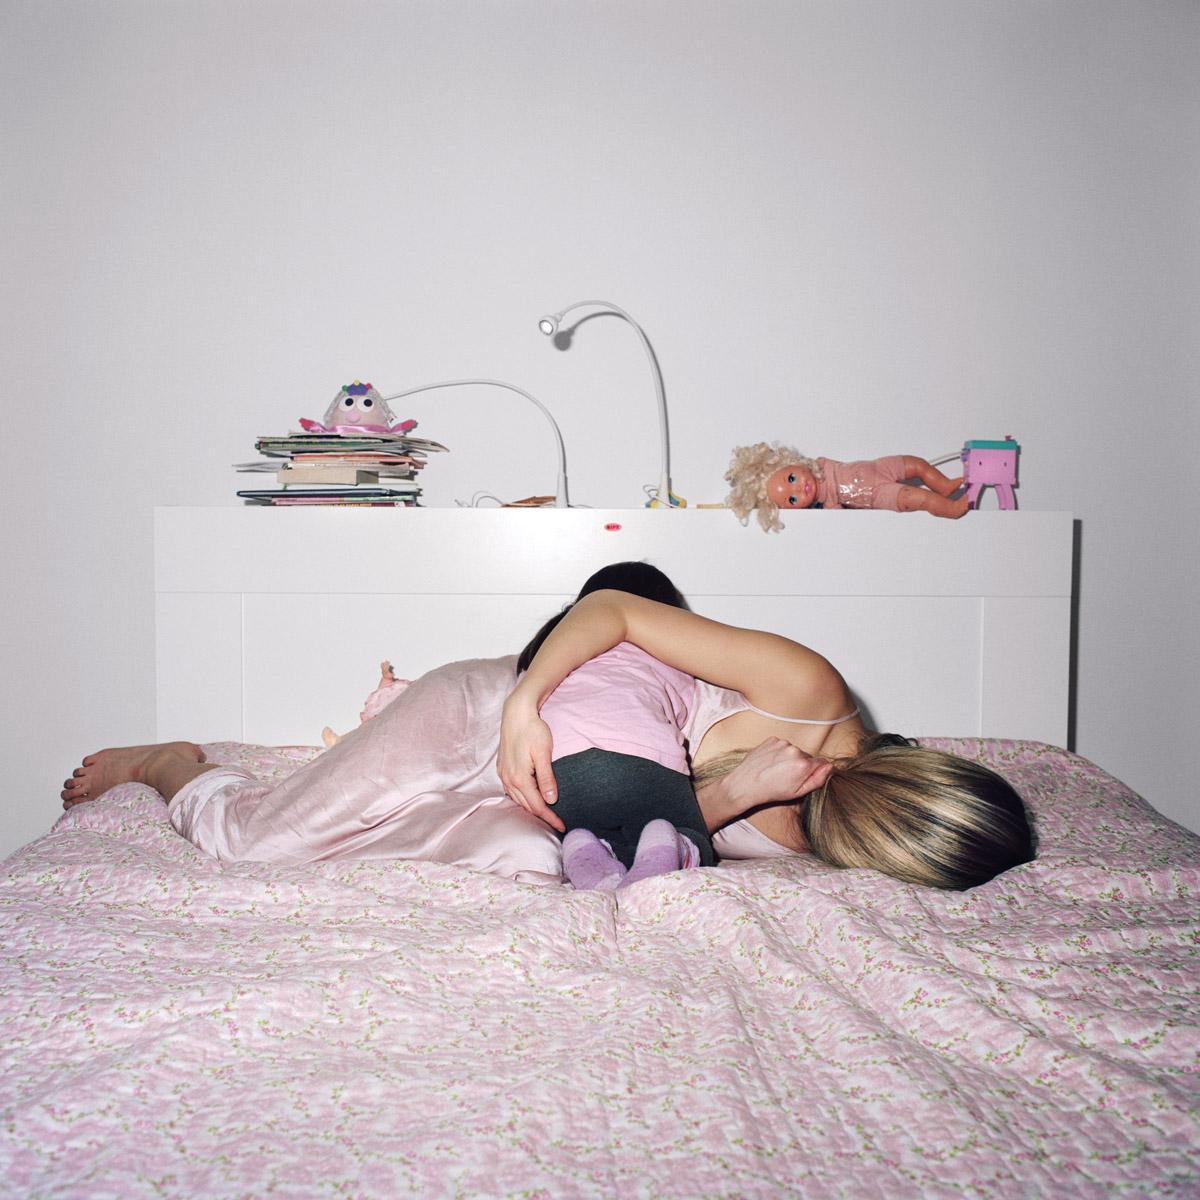 Karen Asher The Full Catastrophe C41 Magazine Issue 9 Eros11